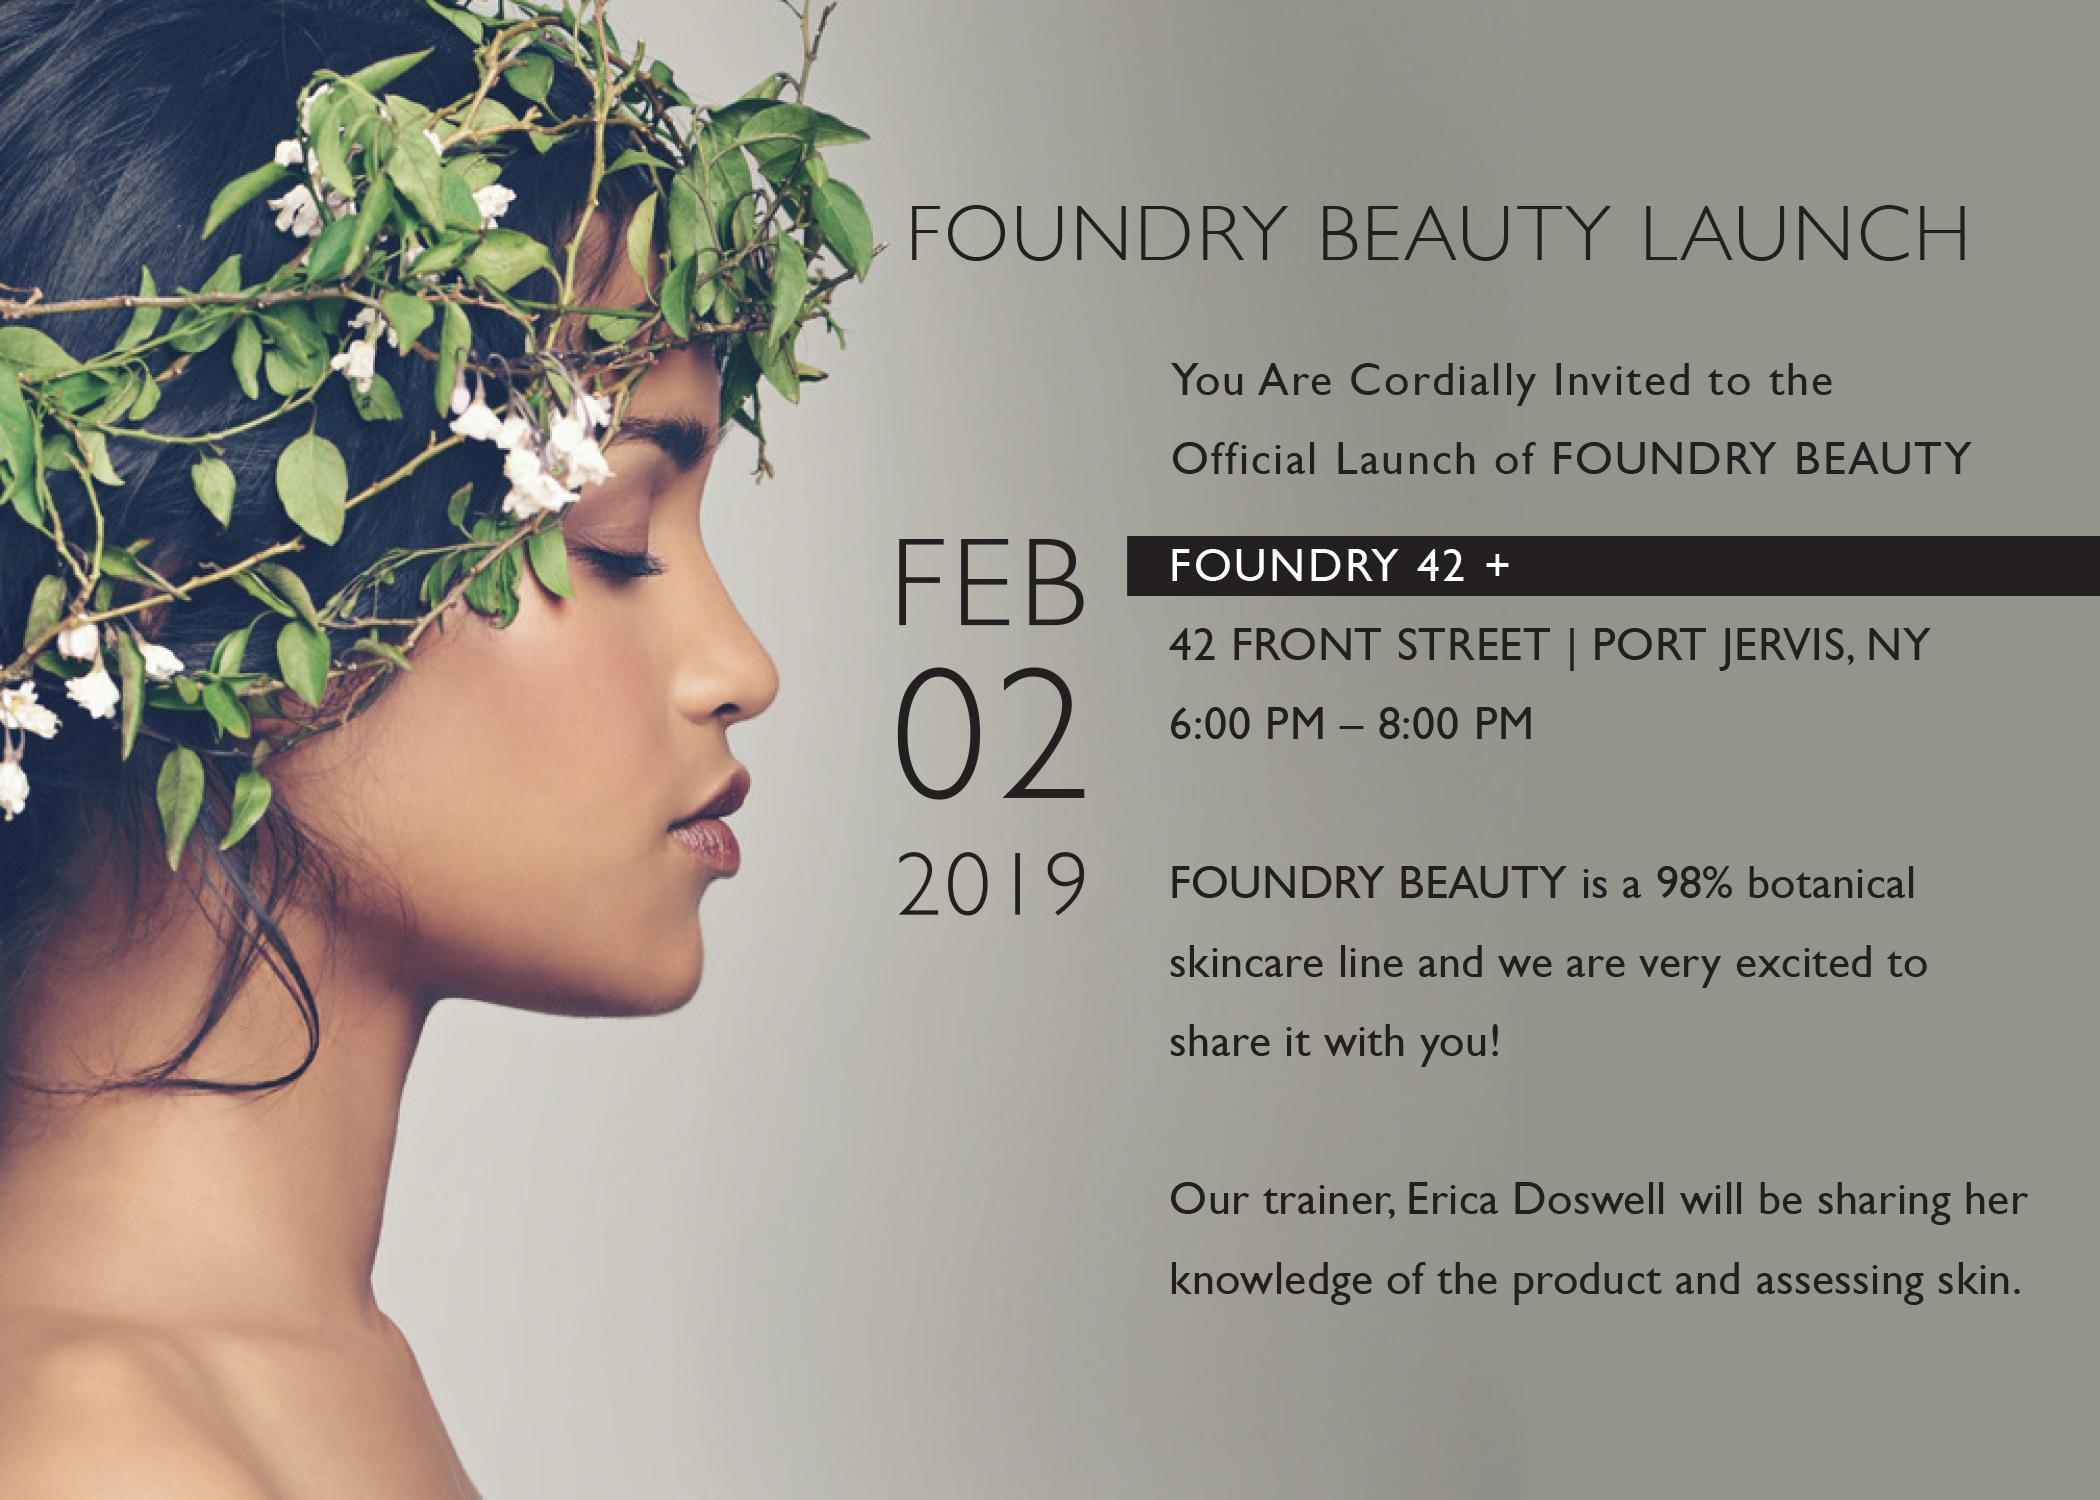 FoundryBeautyInvite.jpg